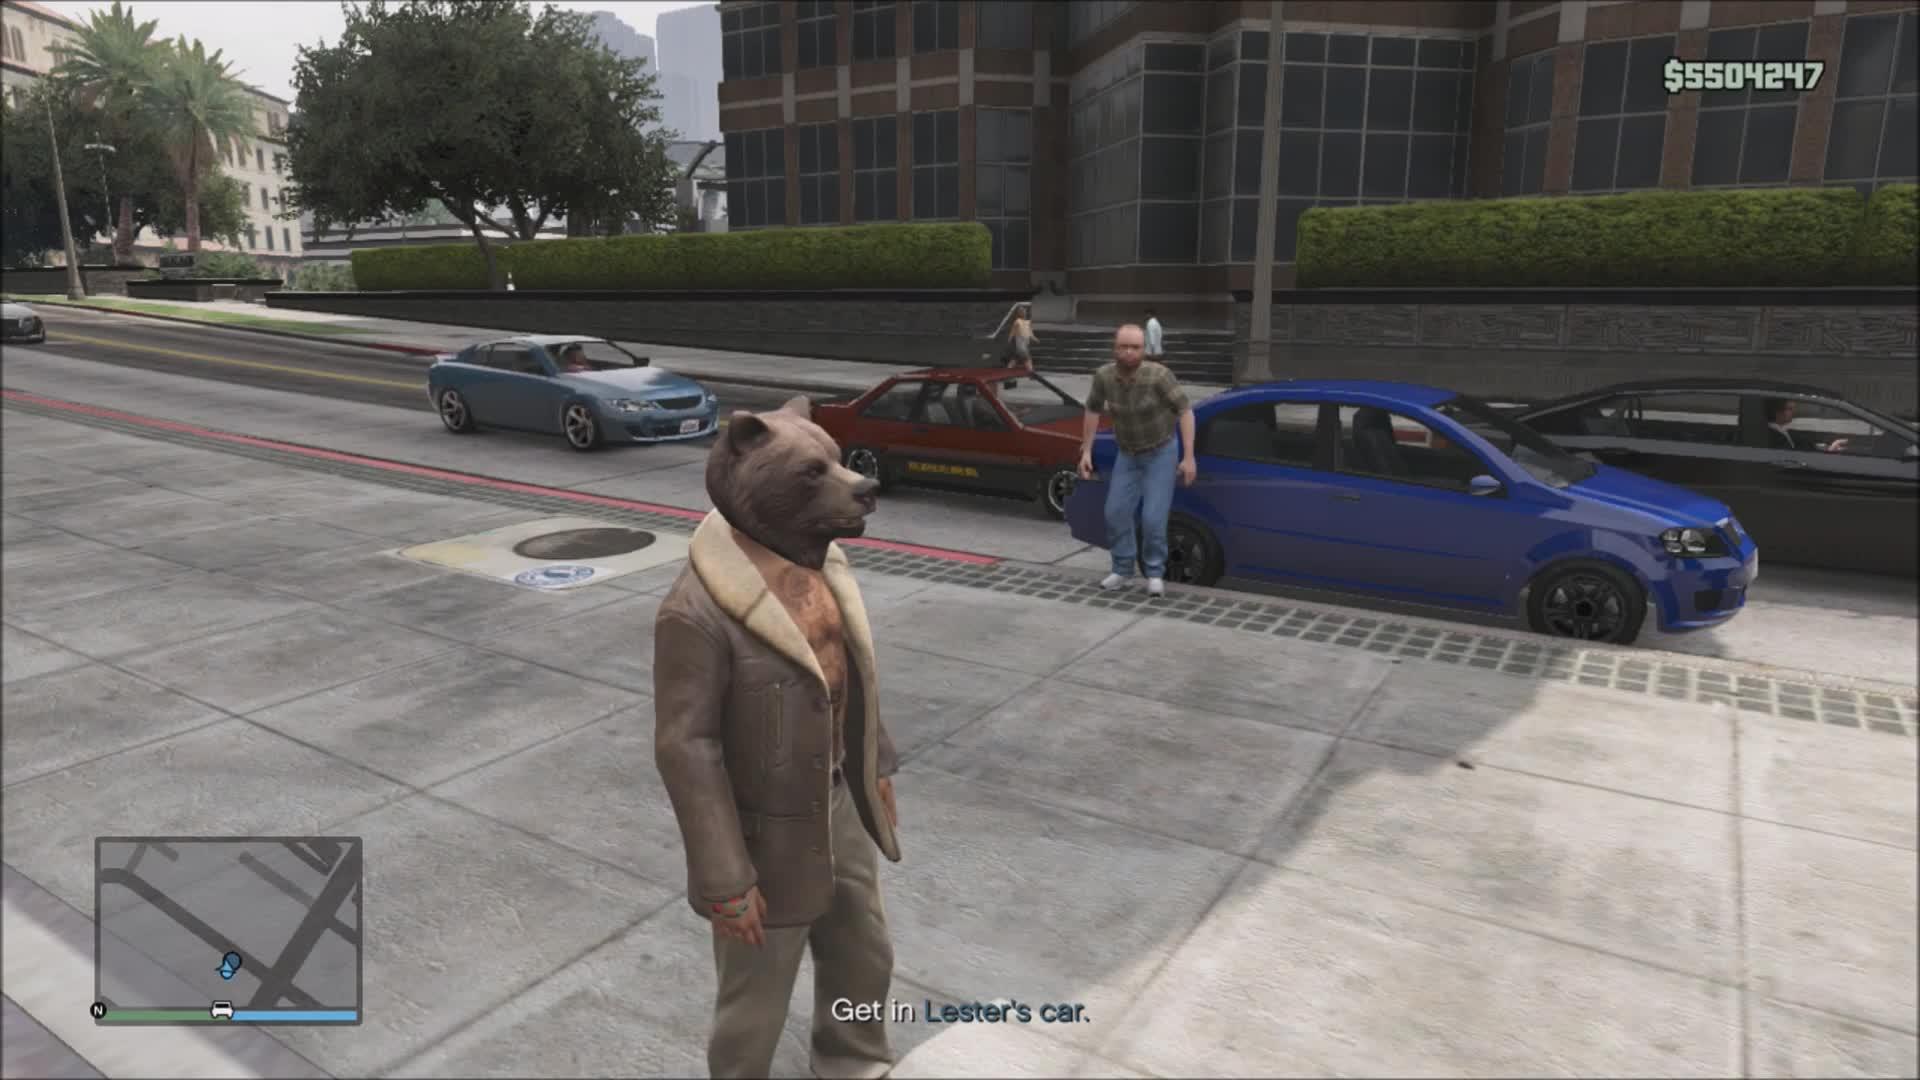 GTA VI Dirty Dozen List Video Watch at Y8